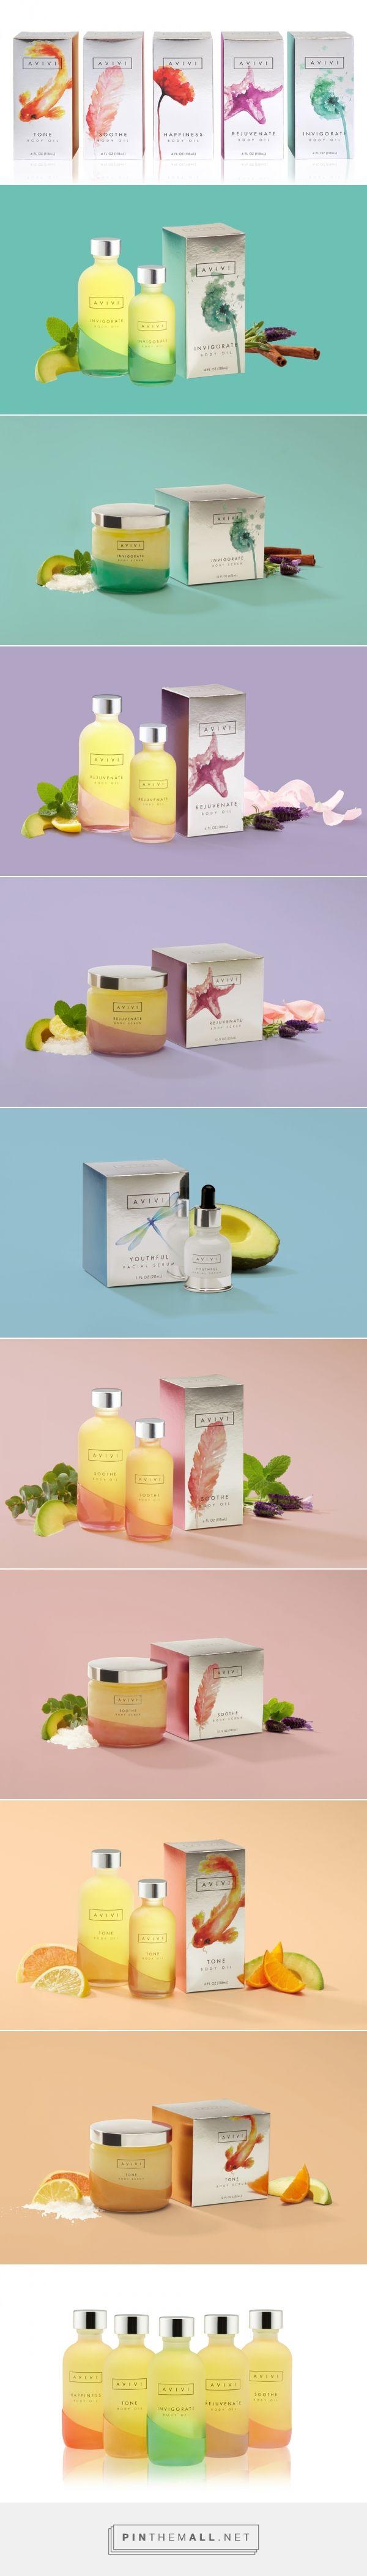 Avivi  cosmetics by MSLK PD